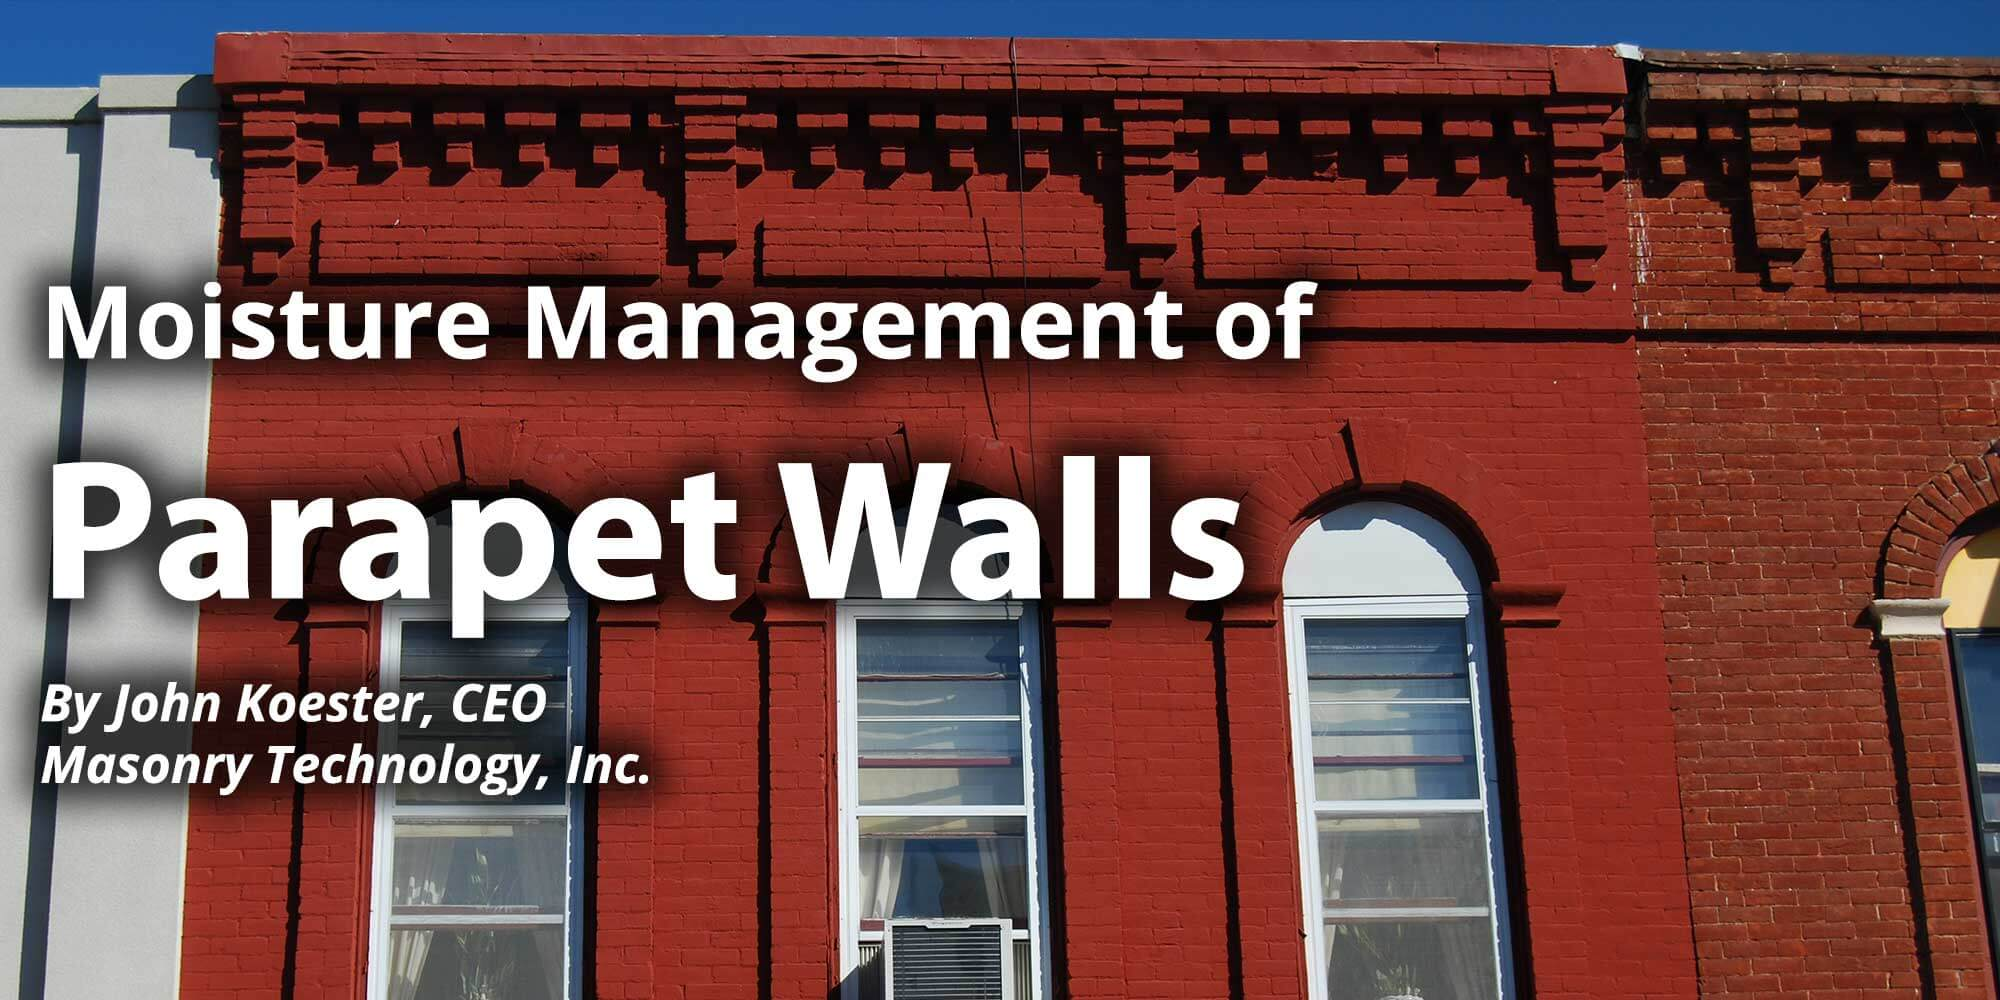 Moisture Management Of Parapet Walls Masonry Technology Inc